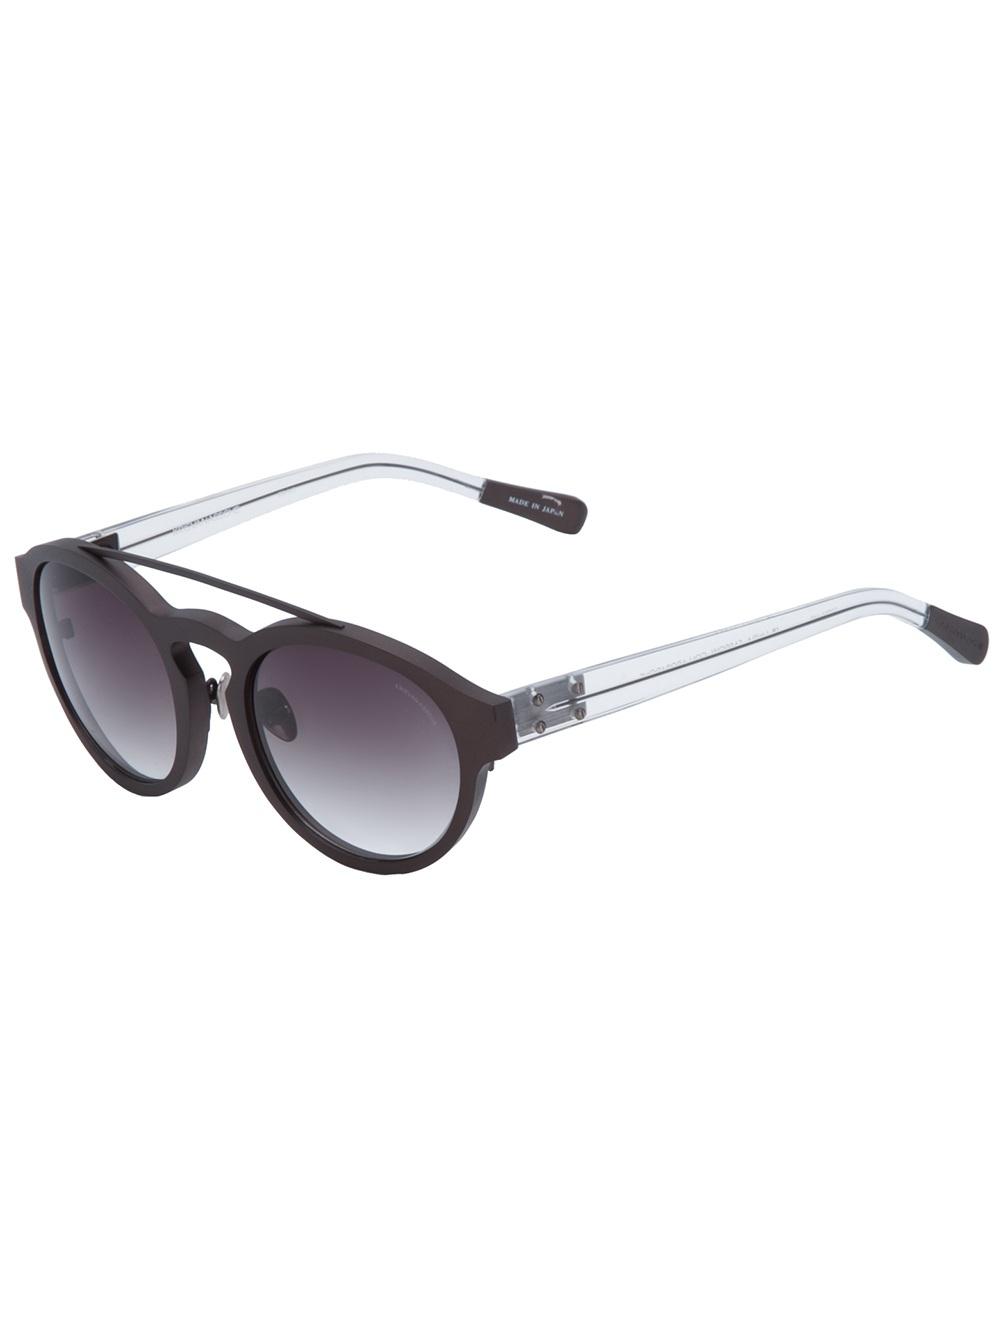 Oakley Batwolf Lenses >> Lyst - Kris Van Assche Round Frame Sunglasses in Black for Men